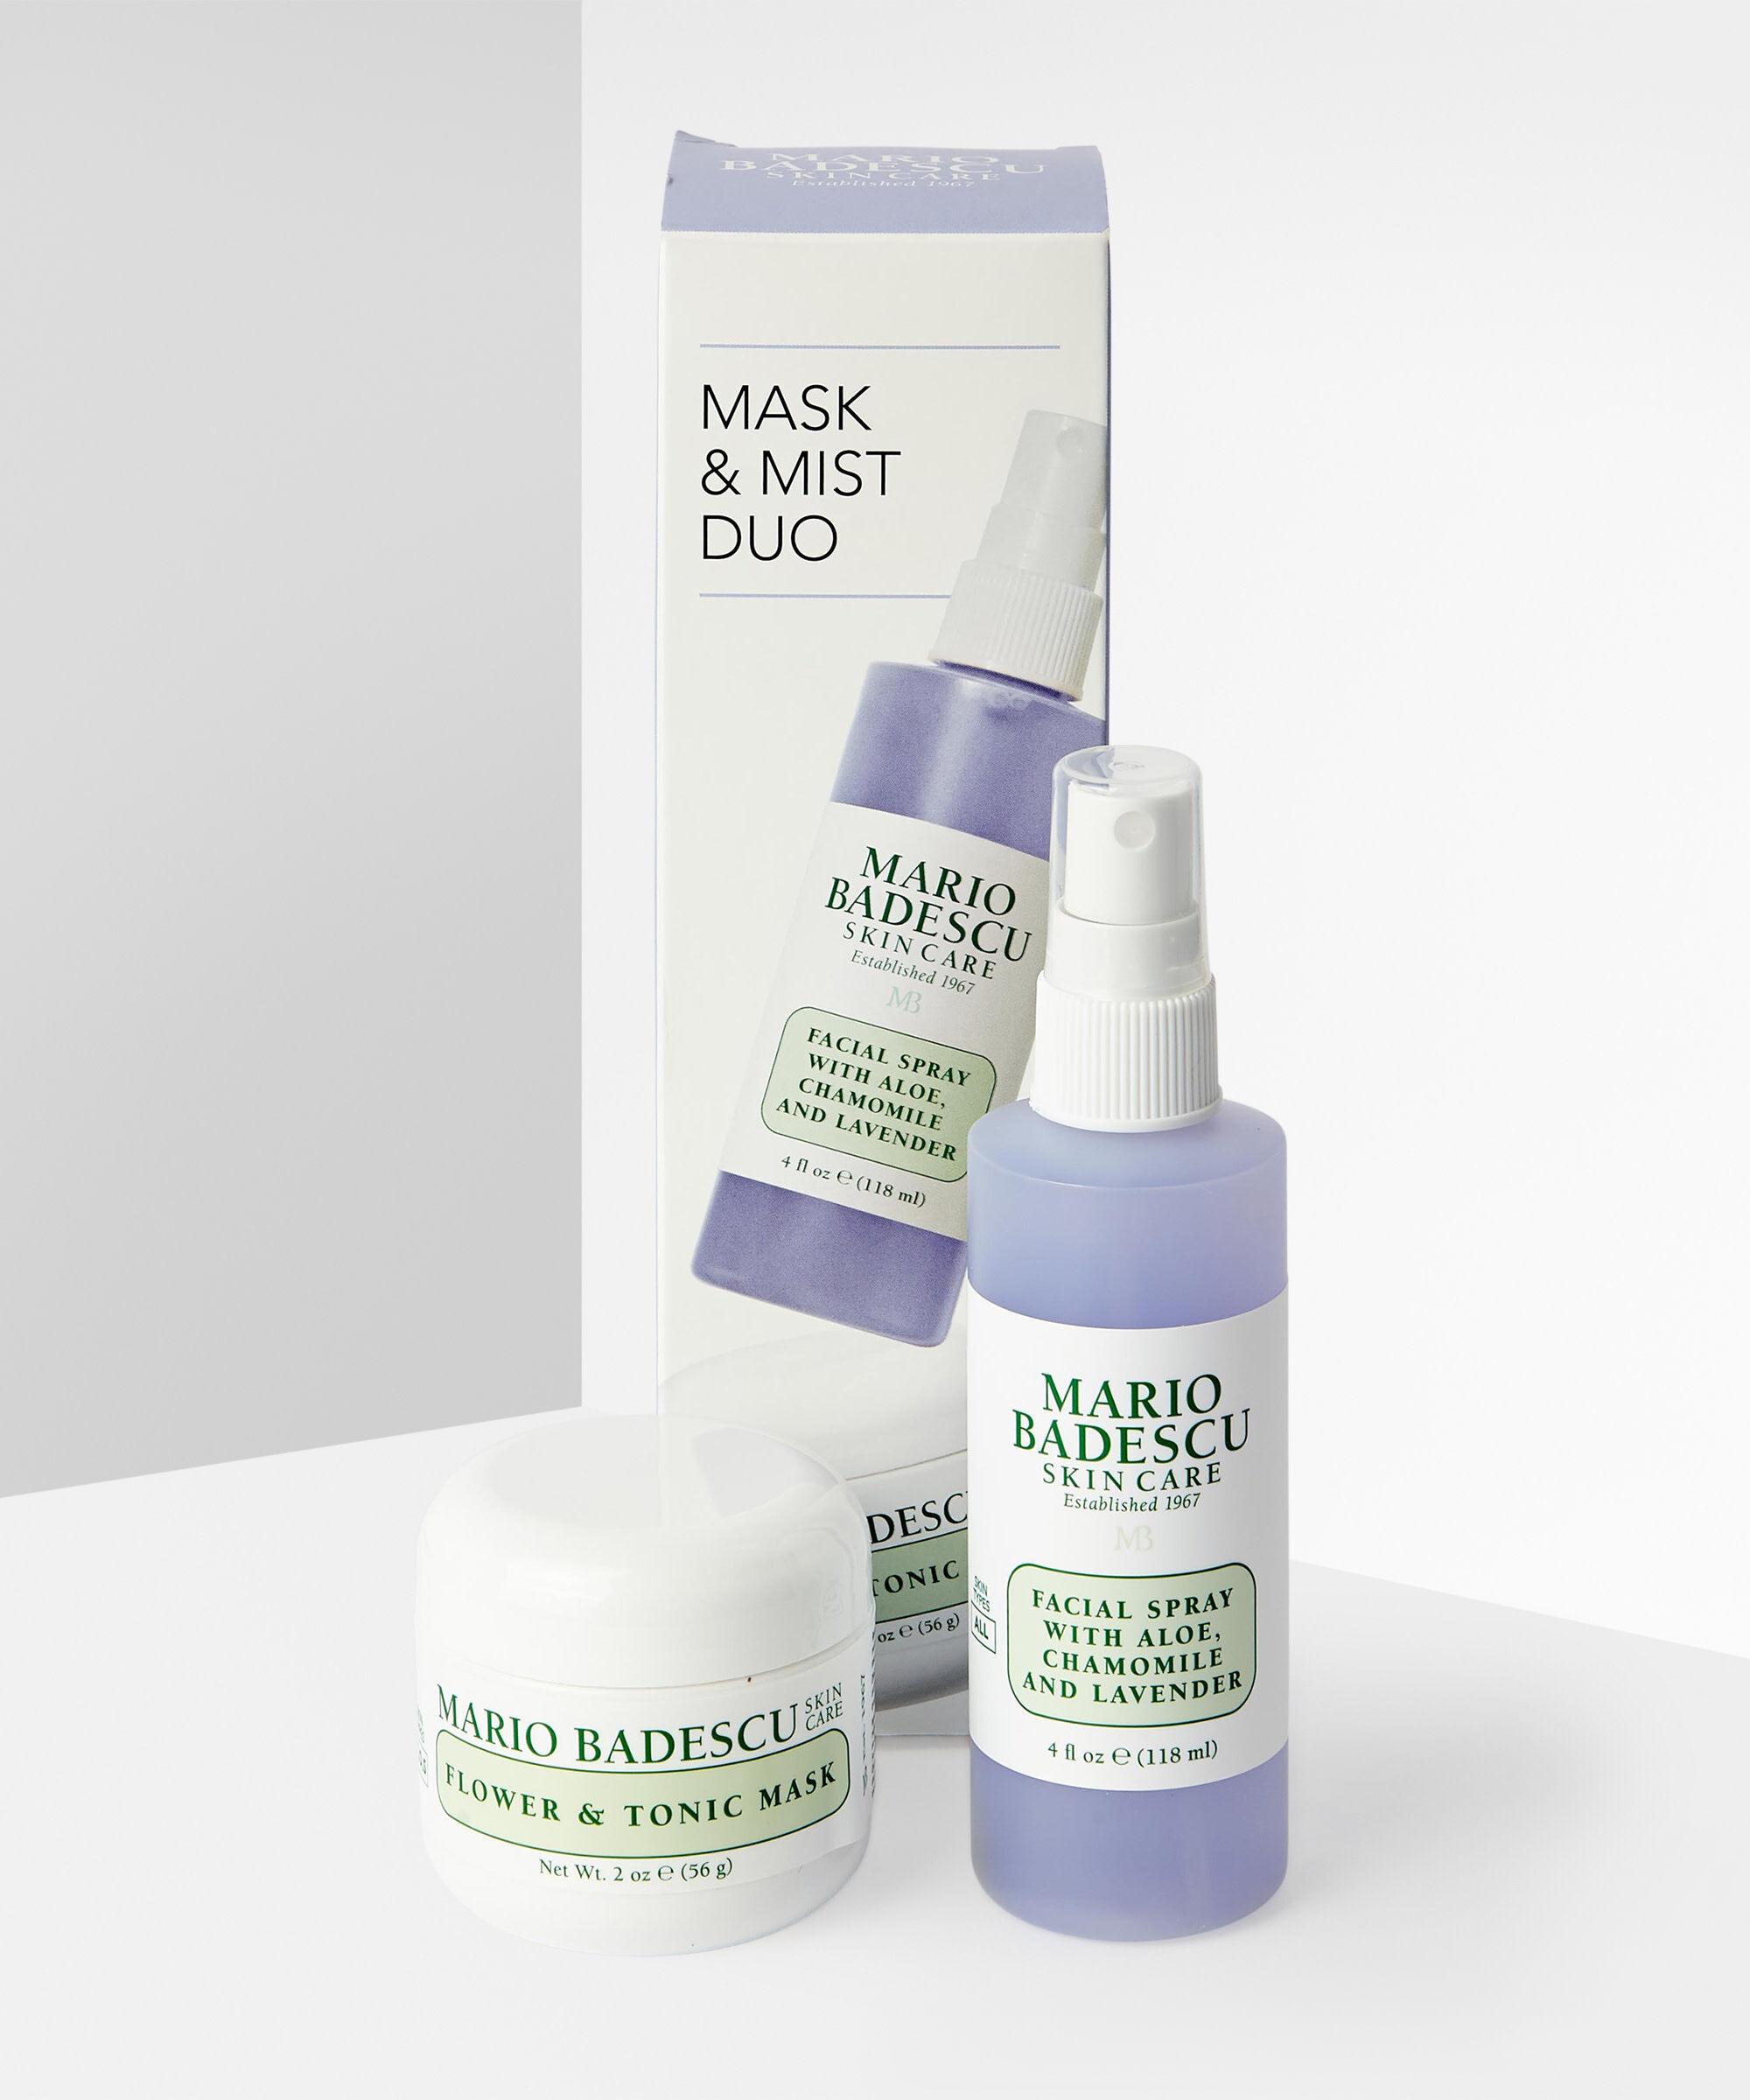 Mario Badescu - Lavender Mask & Mist Duo